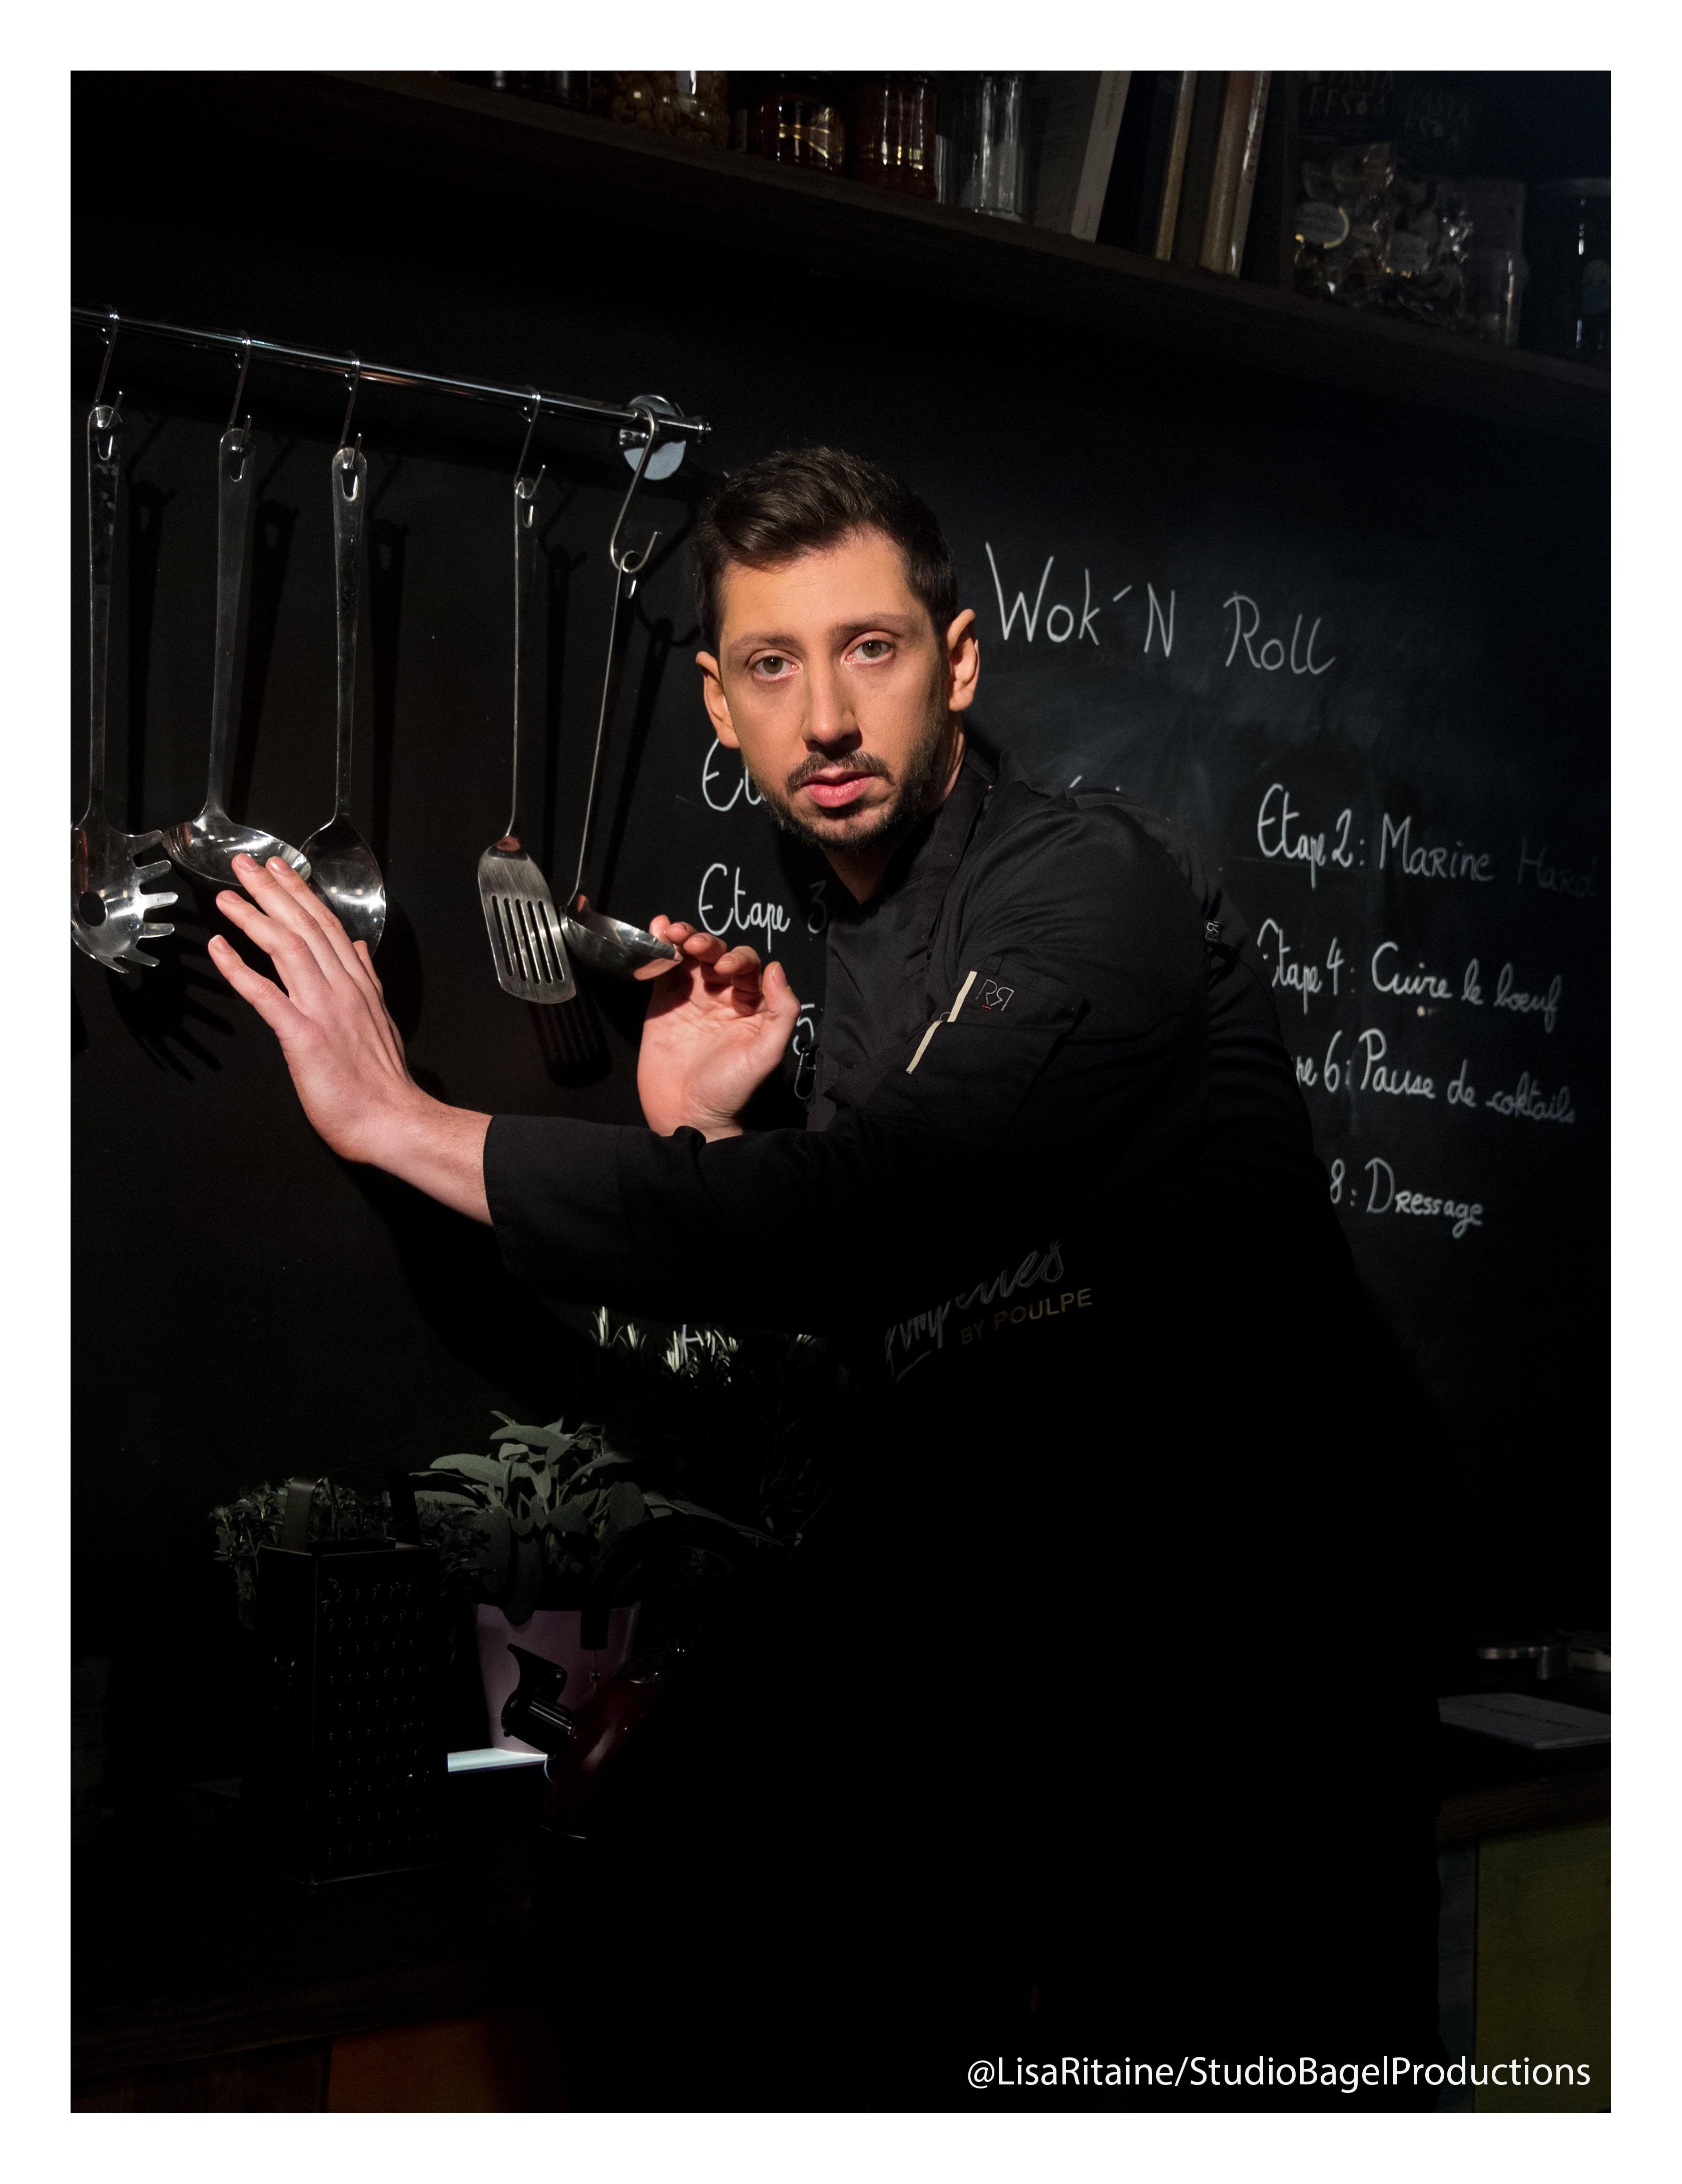 Monsieur Poulpe